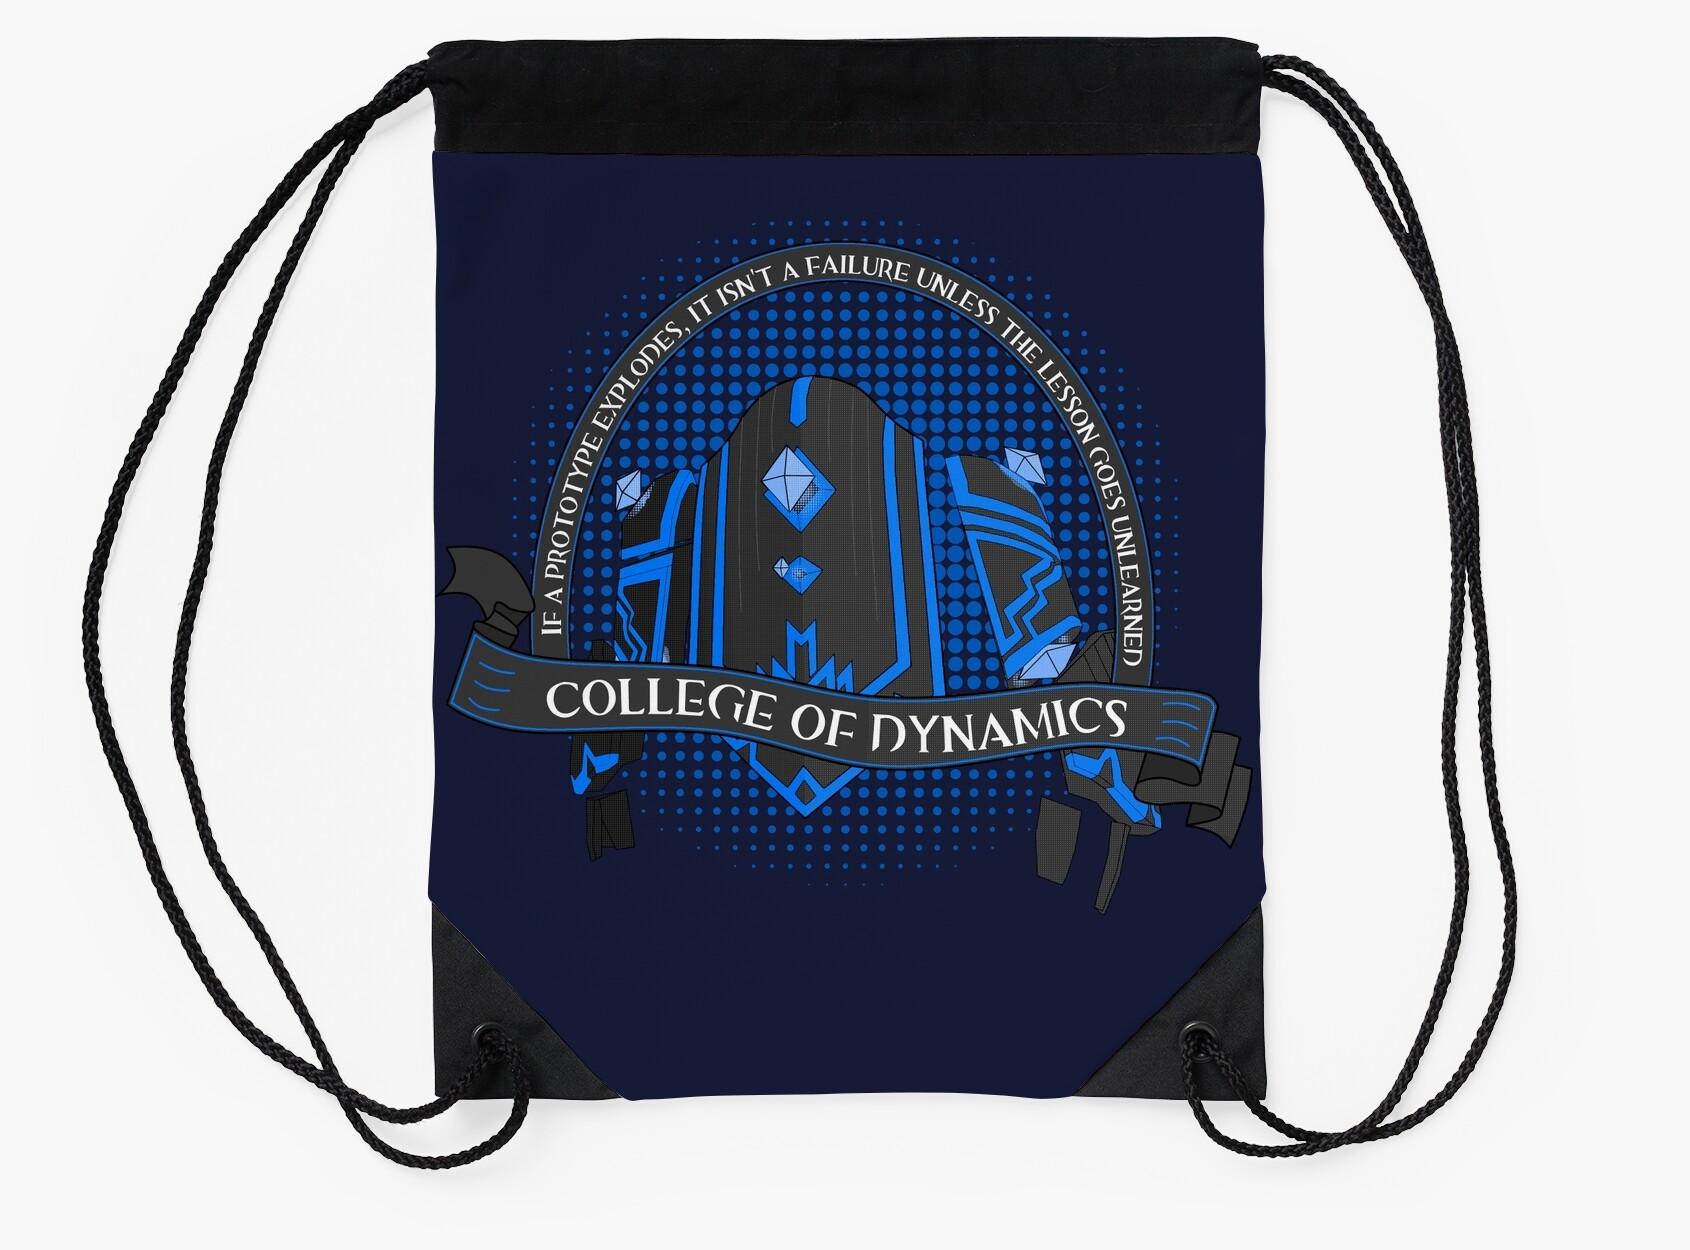 College of Dynamics v2